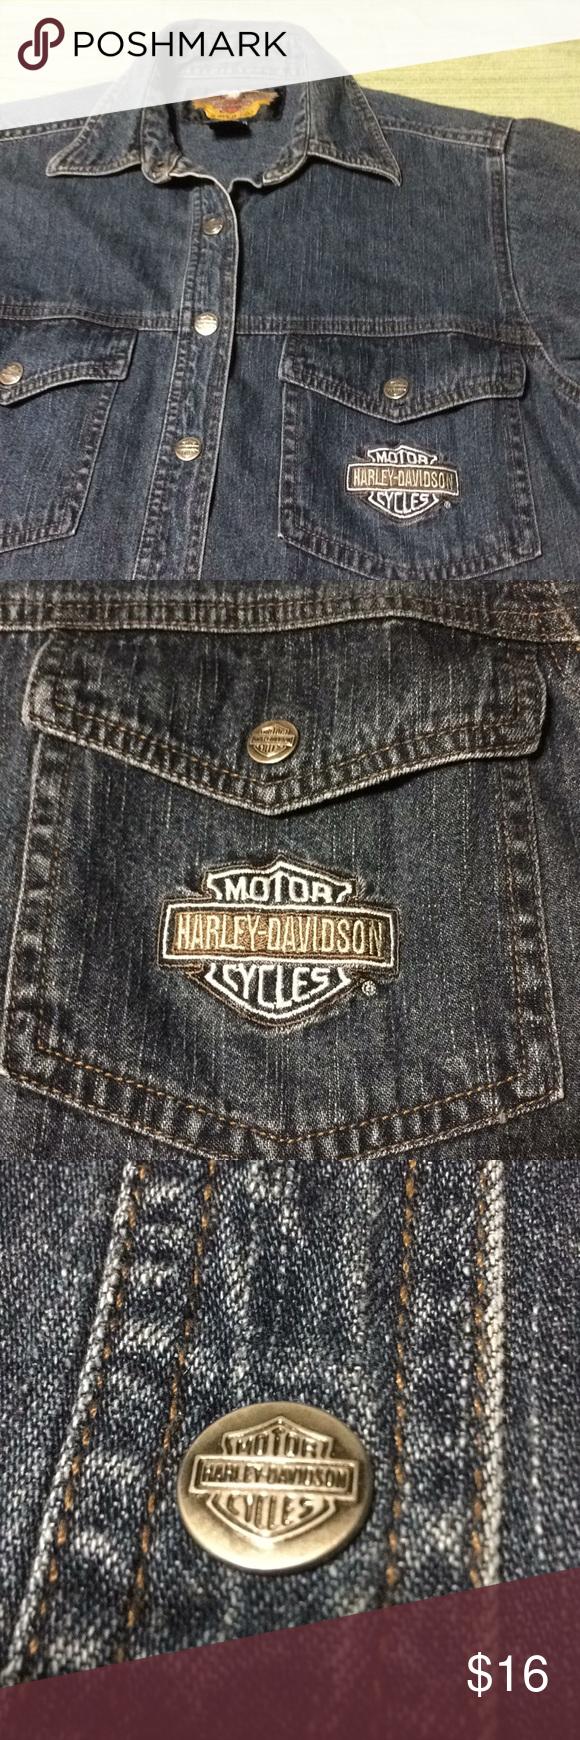 Harley Davidson An American Legend Beautiful Shirt Beautiful Shirt Harley Davidson American Legend